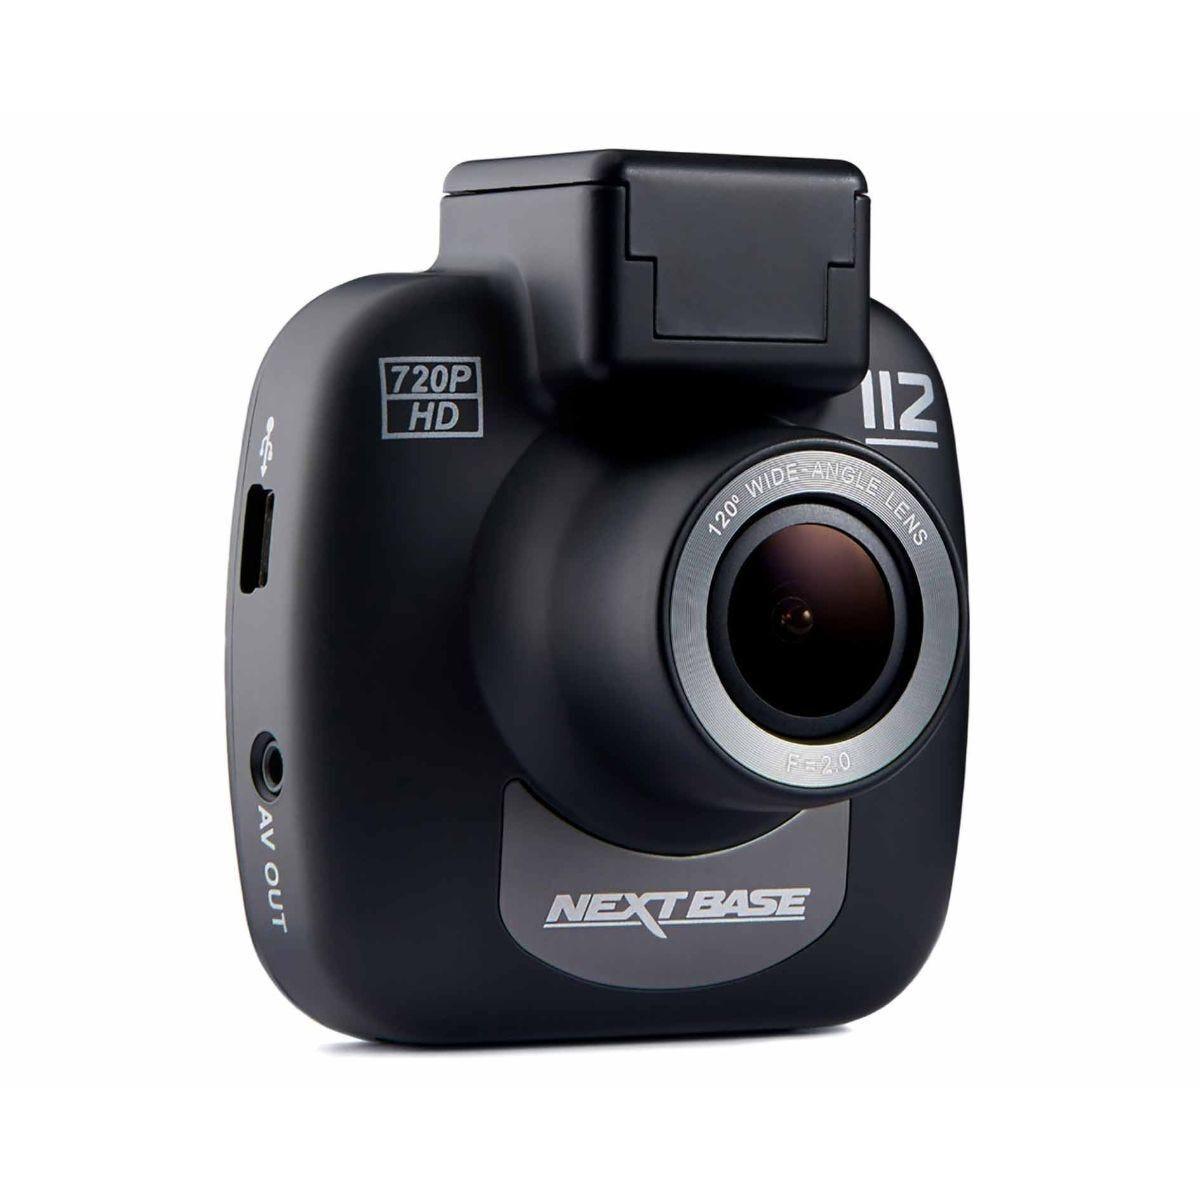 Nextbase 112 Dash Camera 720p HD